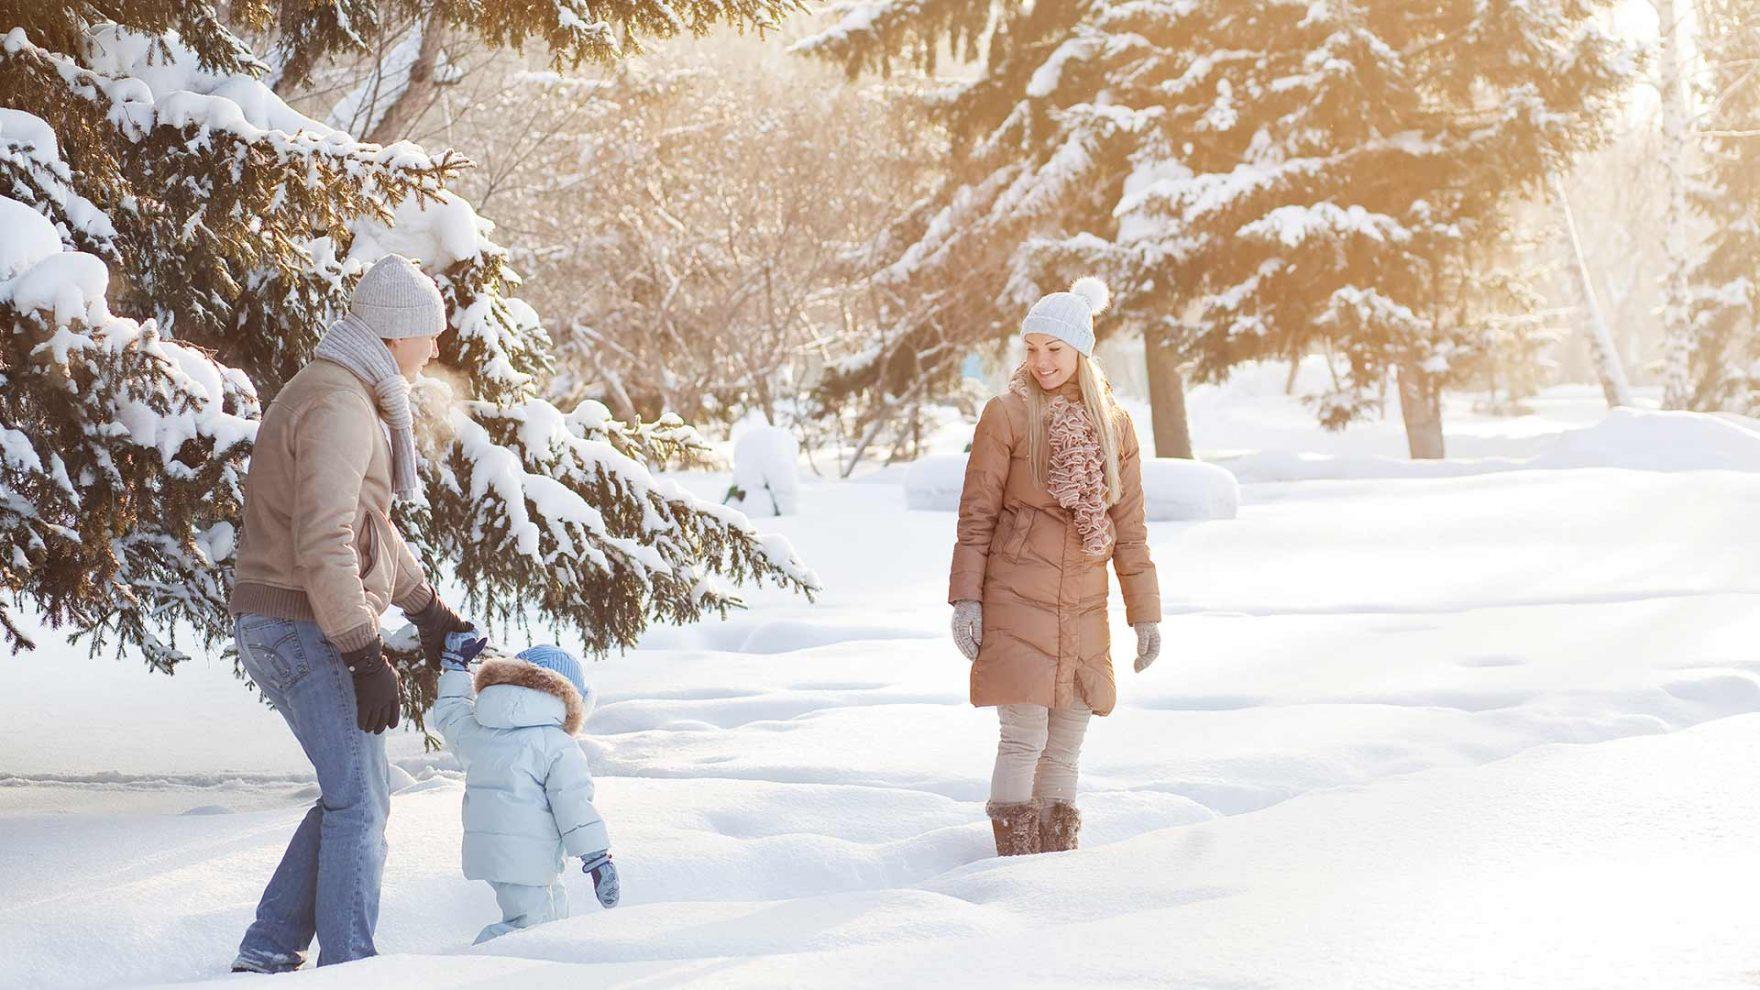 Vacanze invernali a Merano e dintorni - Vacanze in famiglia